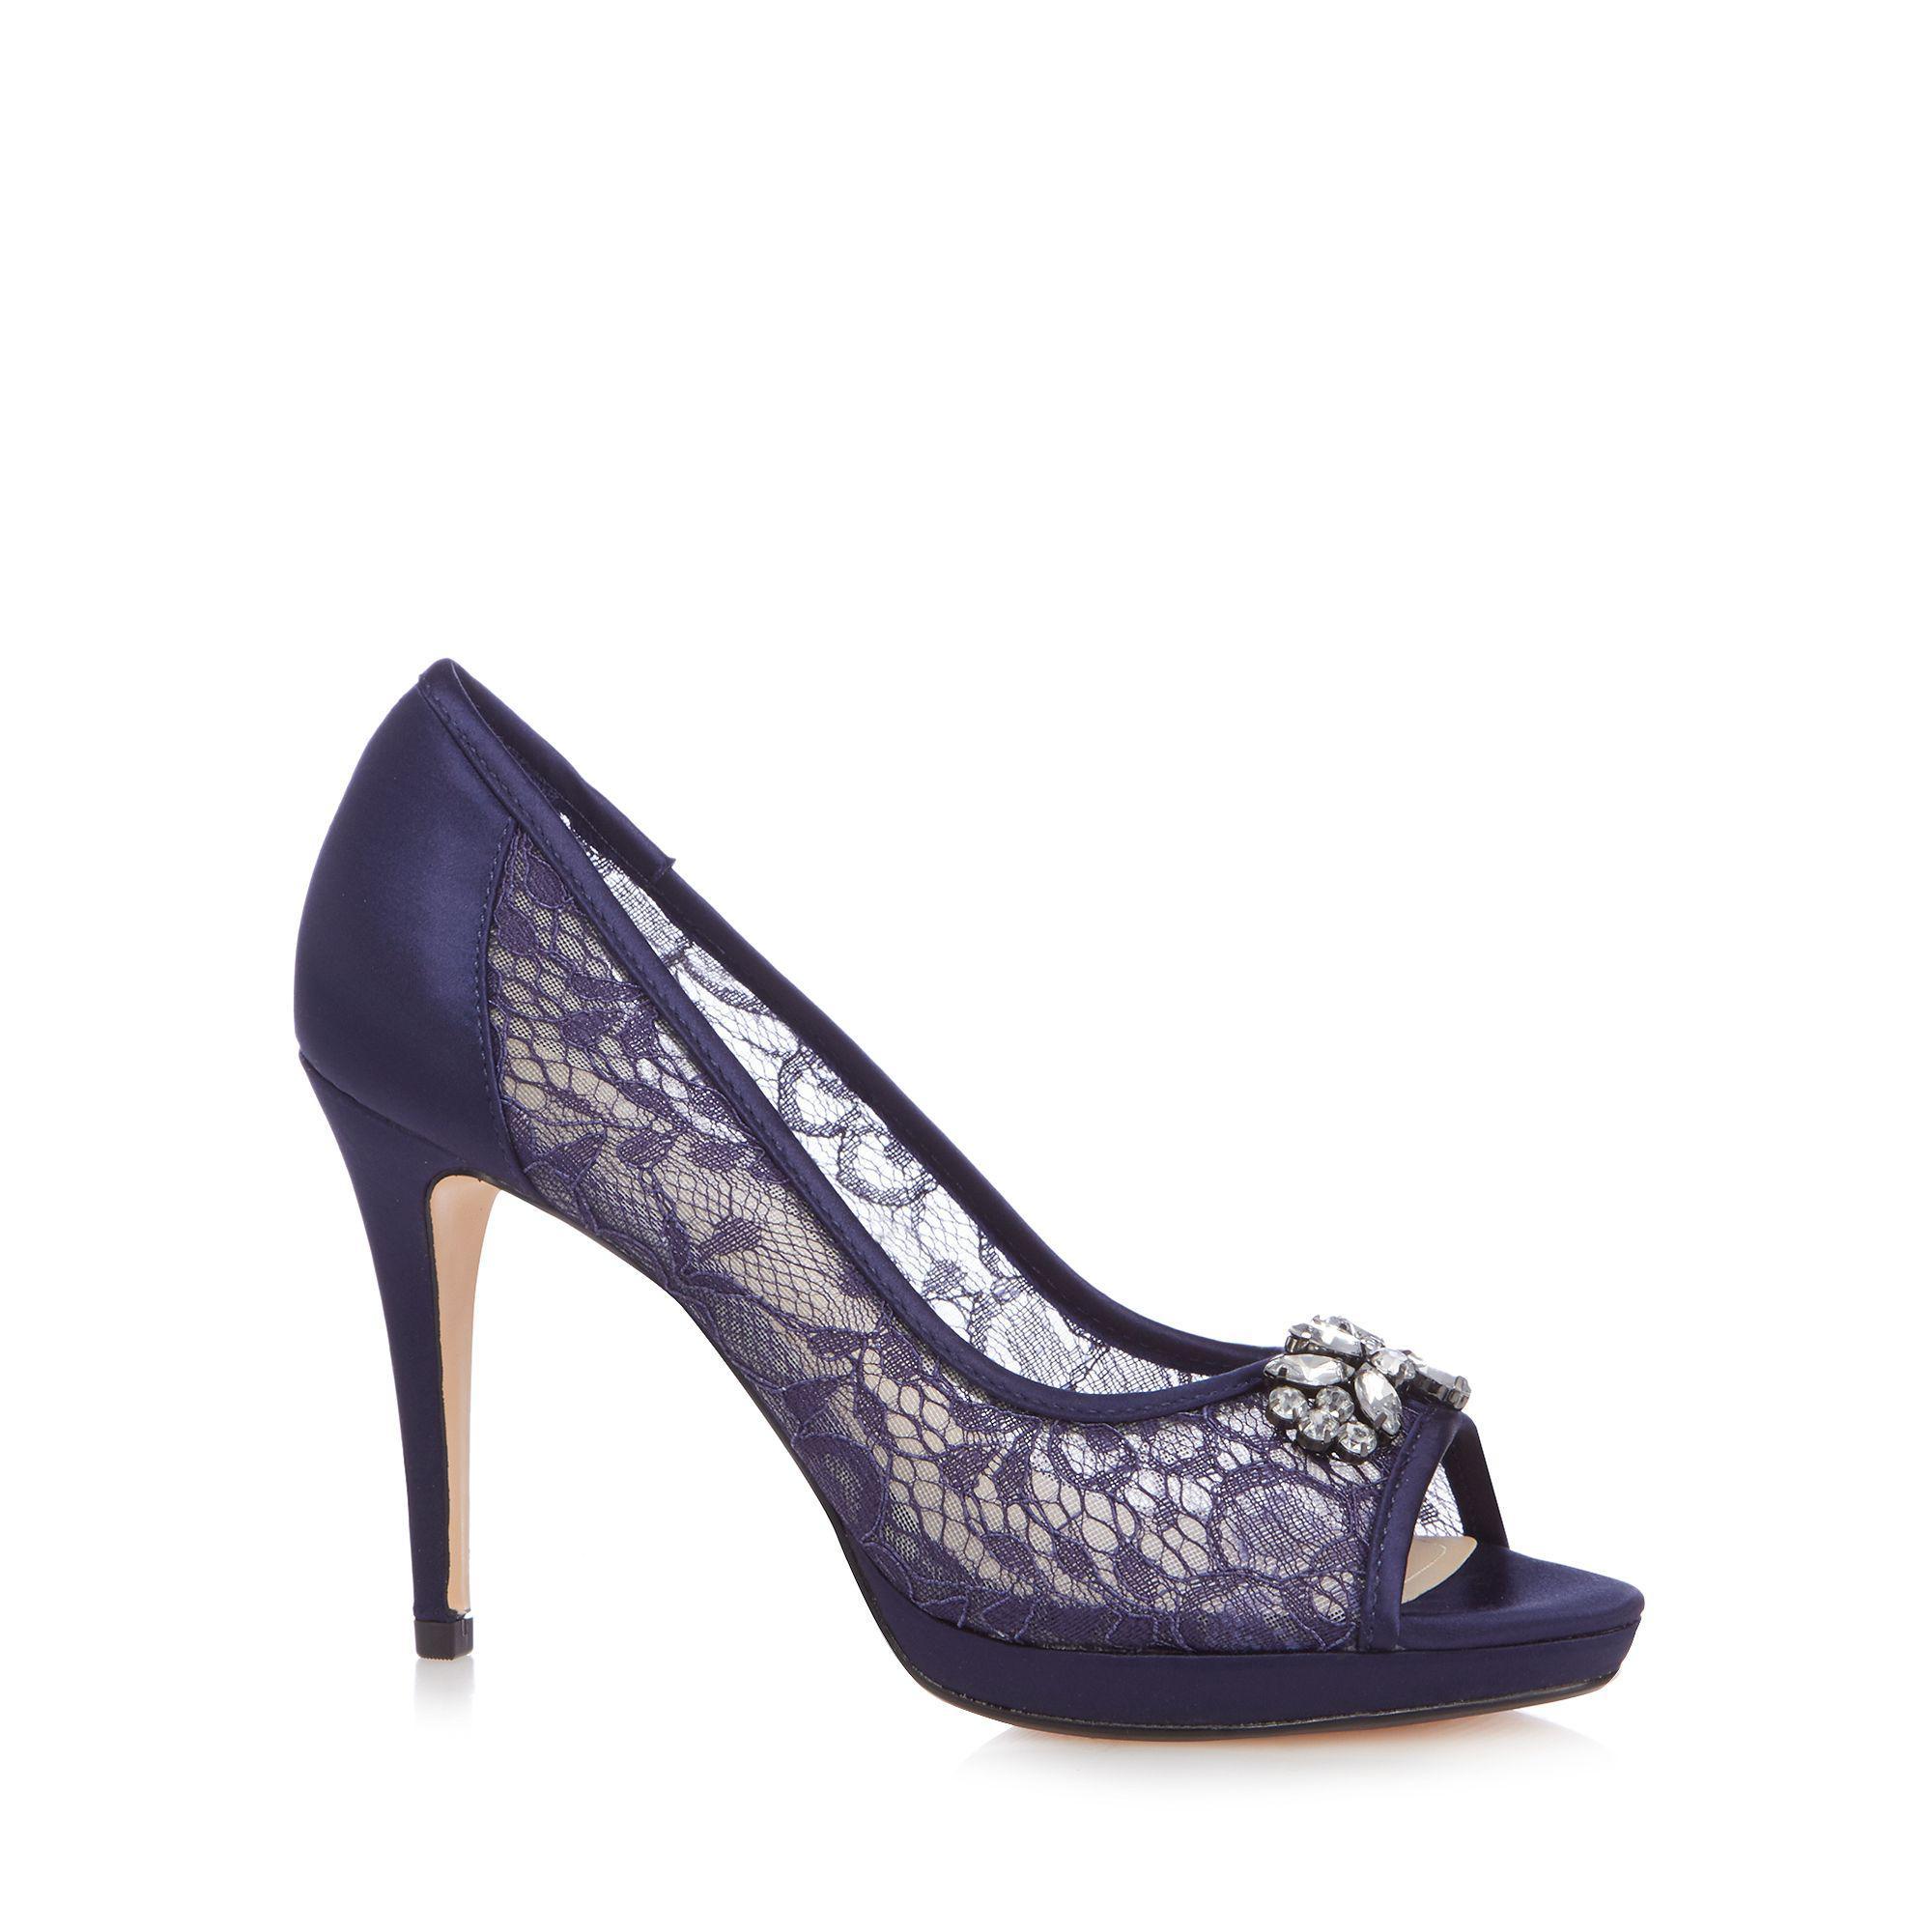 e0f55b67f515 Début Navy Lace  doreen  High Stiletto Heel Peep Toe Shoes in Blue ...